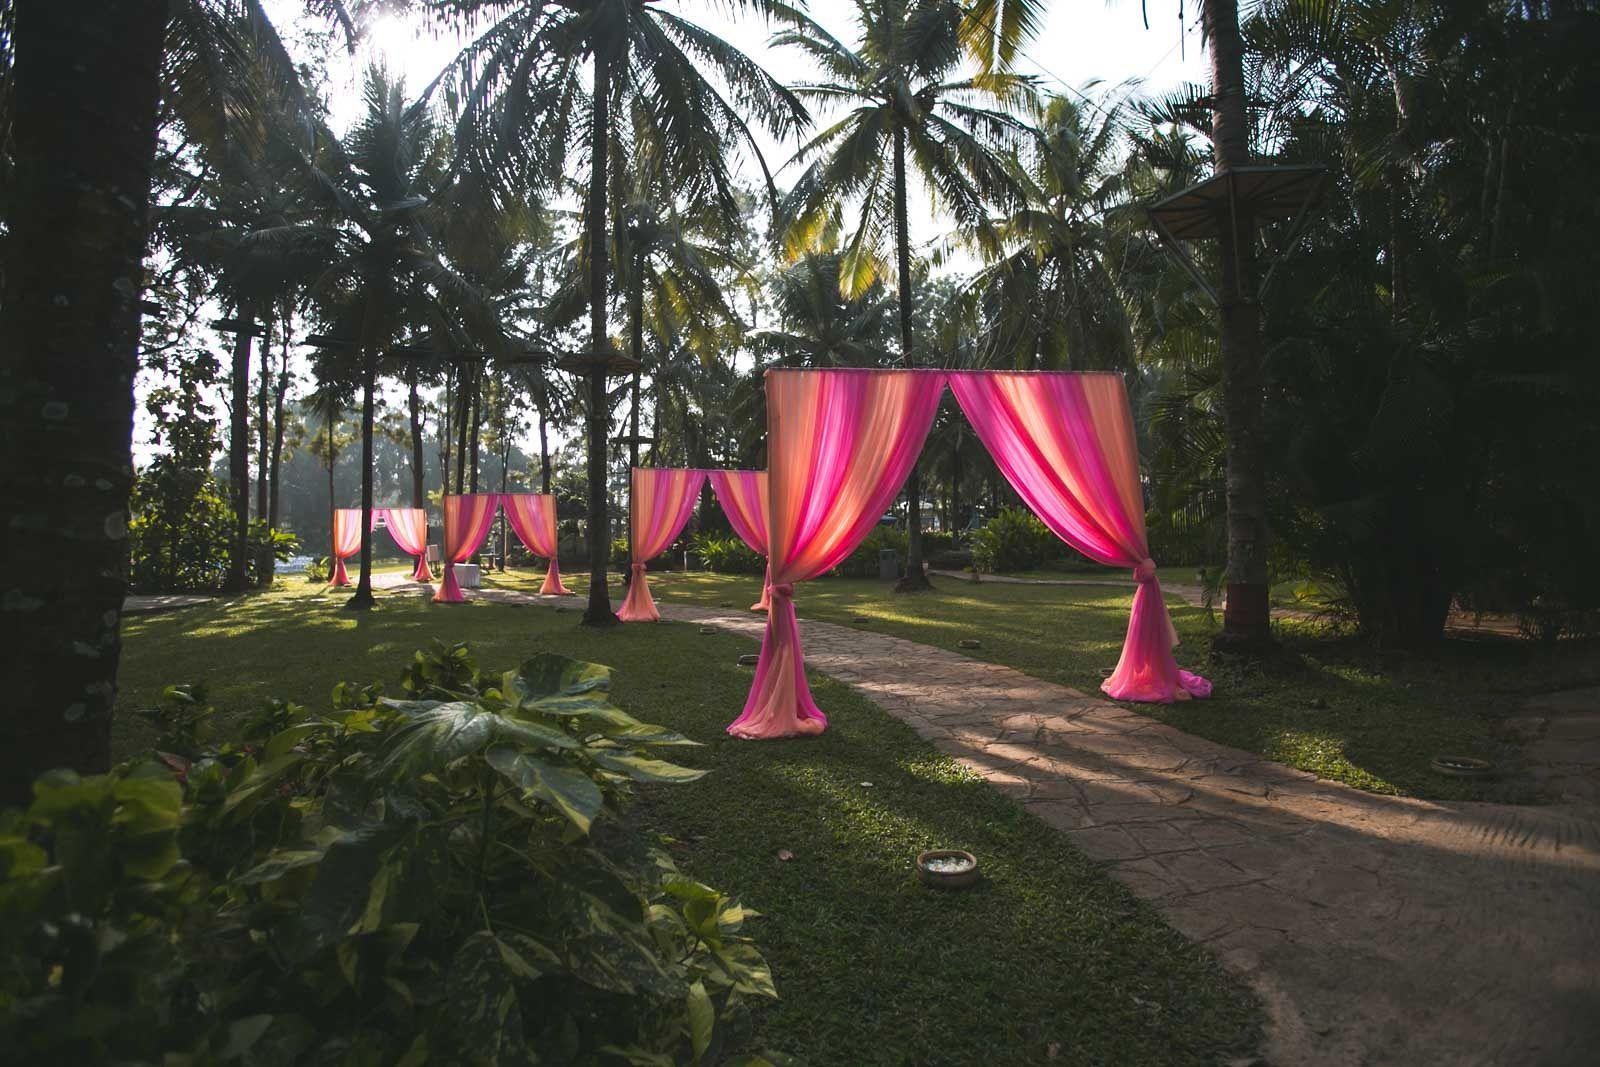 Indian themed wedding décor ideas in 2020 Destination